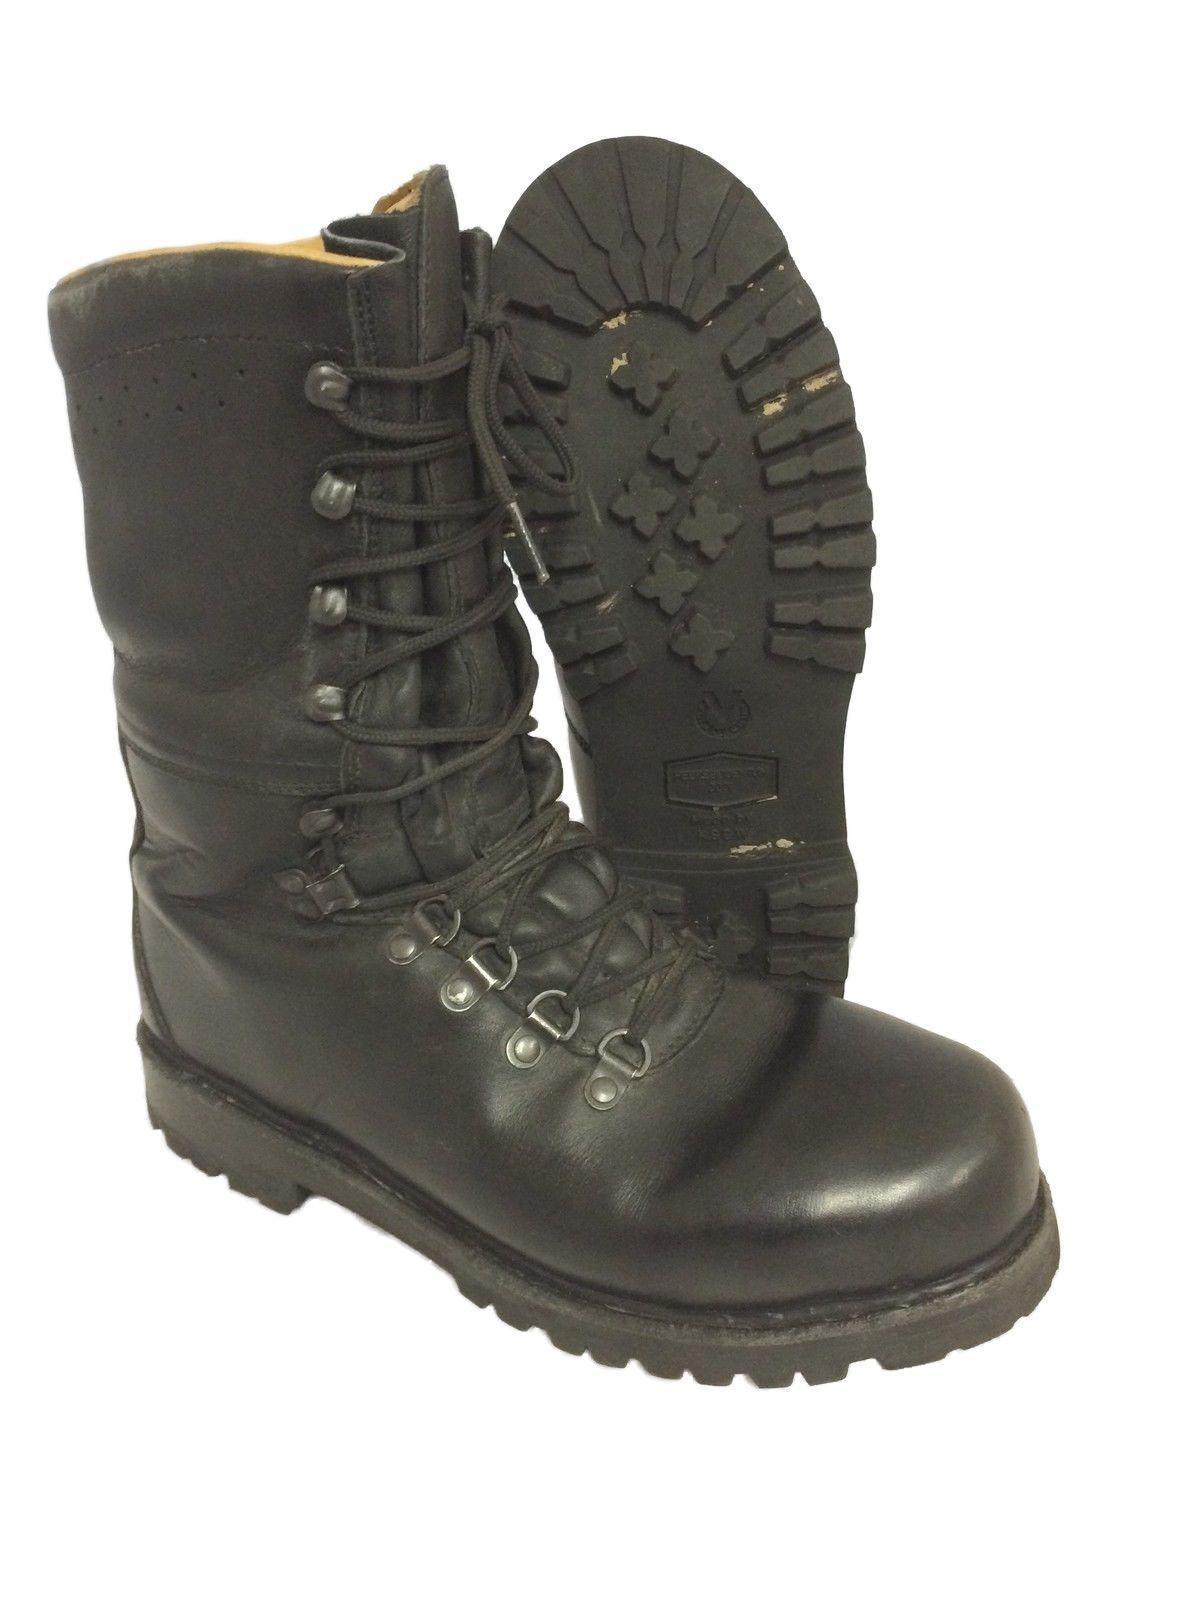 Austriaca combattere Boot, superba para Boot, ultima generazione, superba Boot, qualità, PARACADUTISTI 0faa76